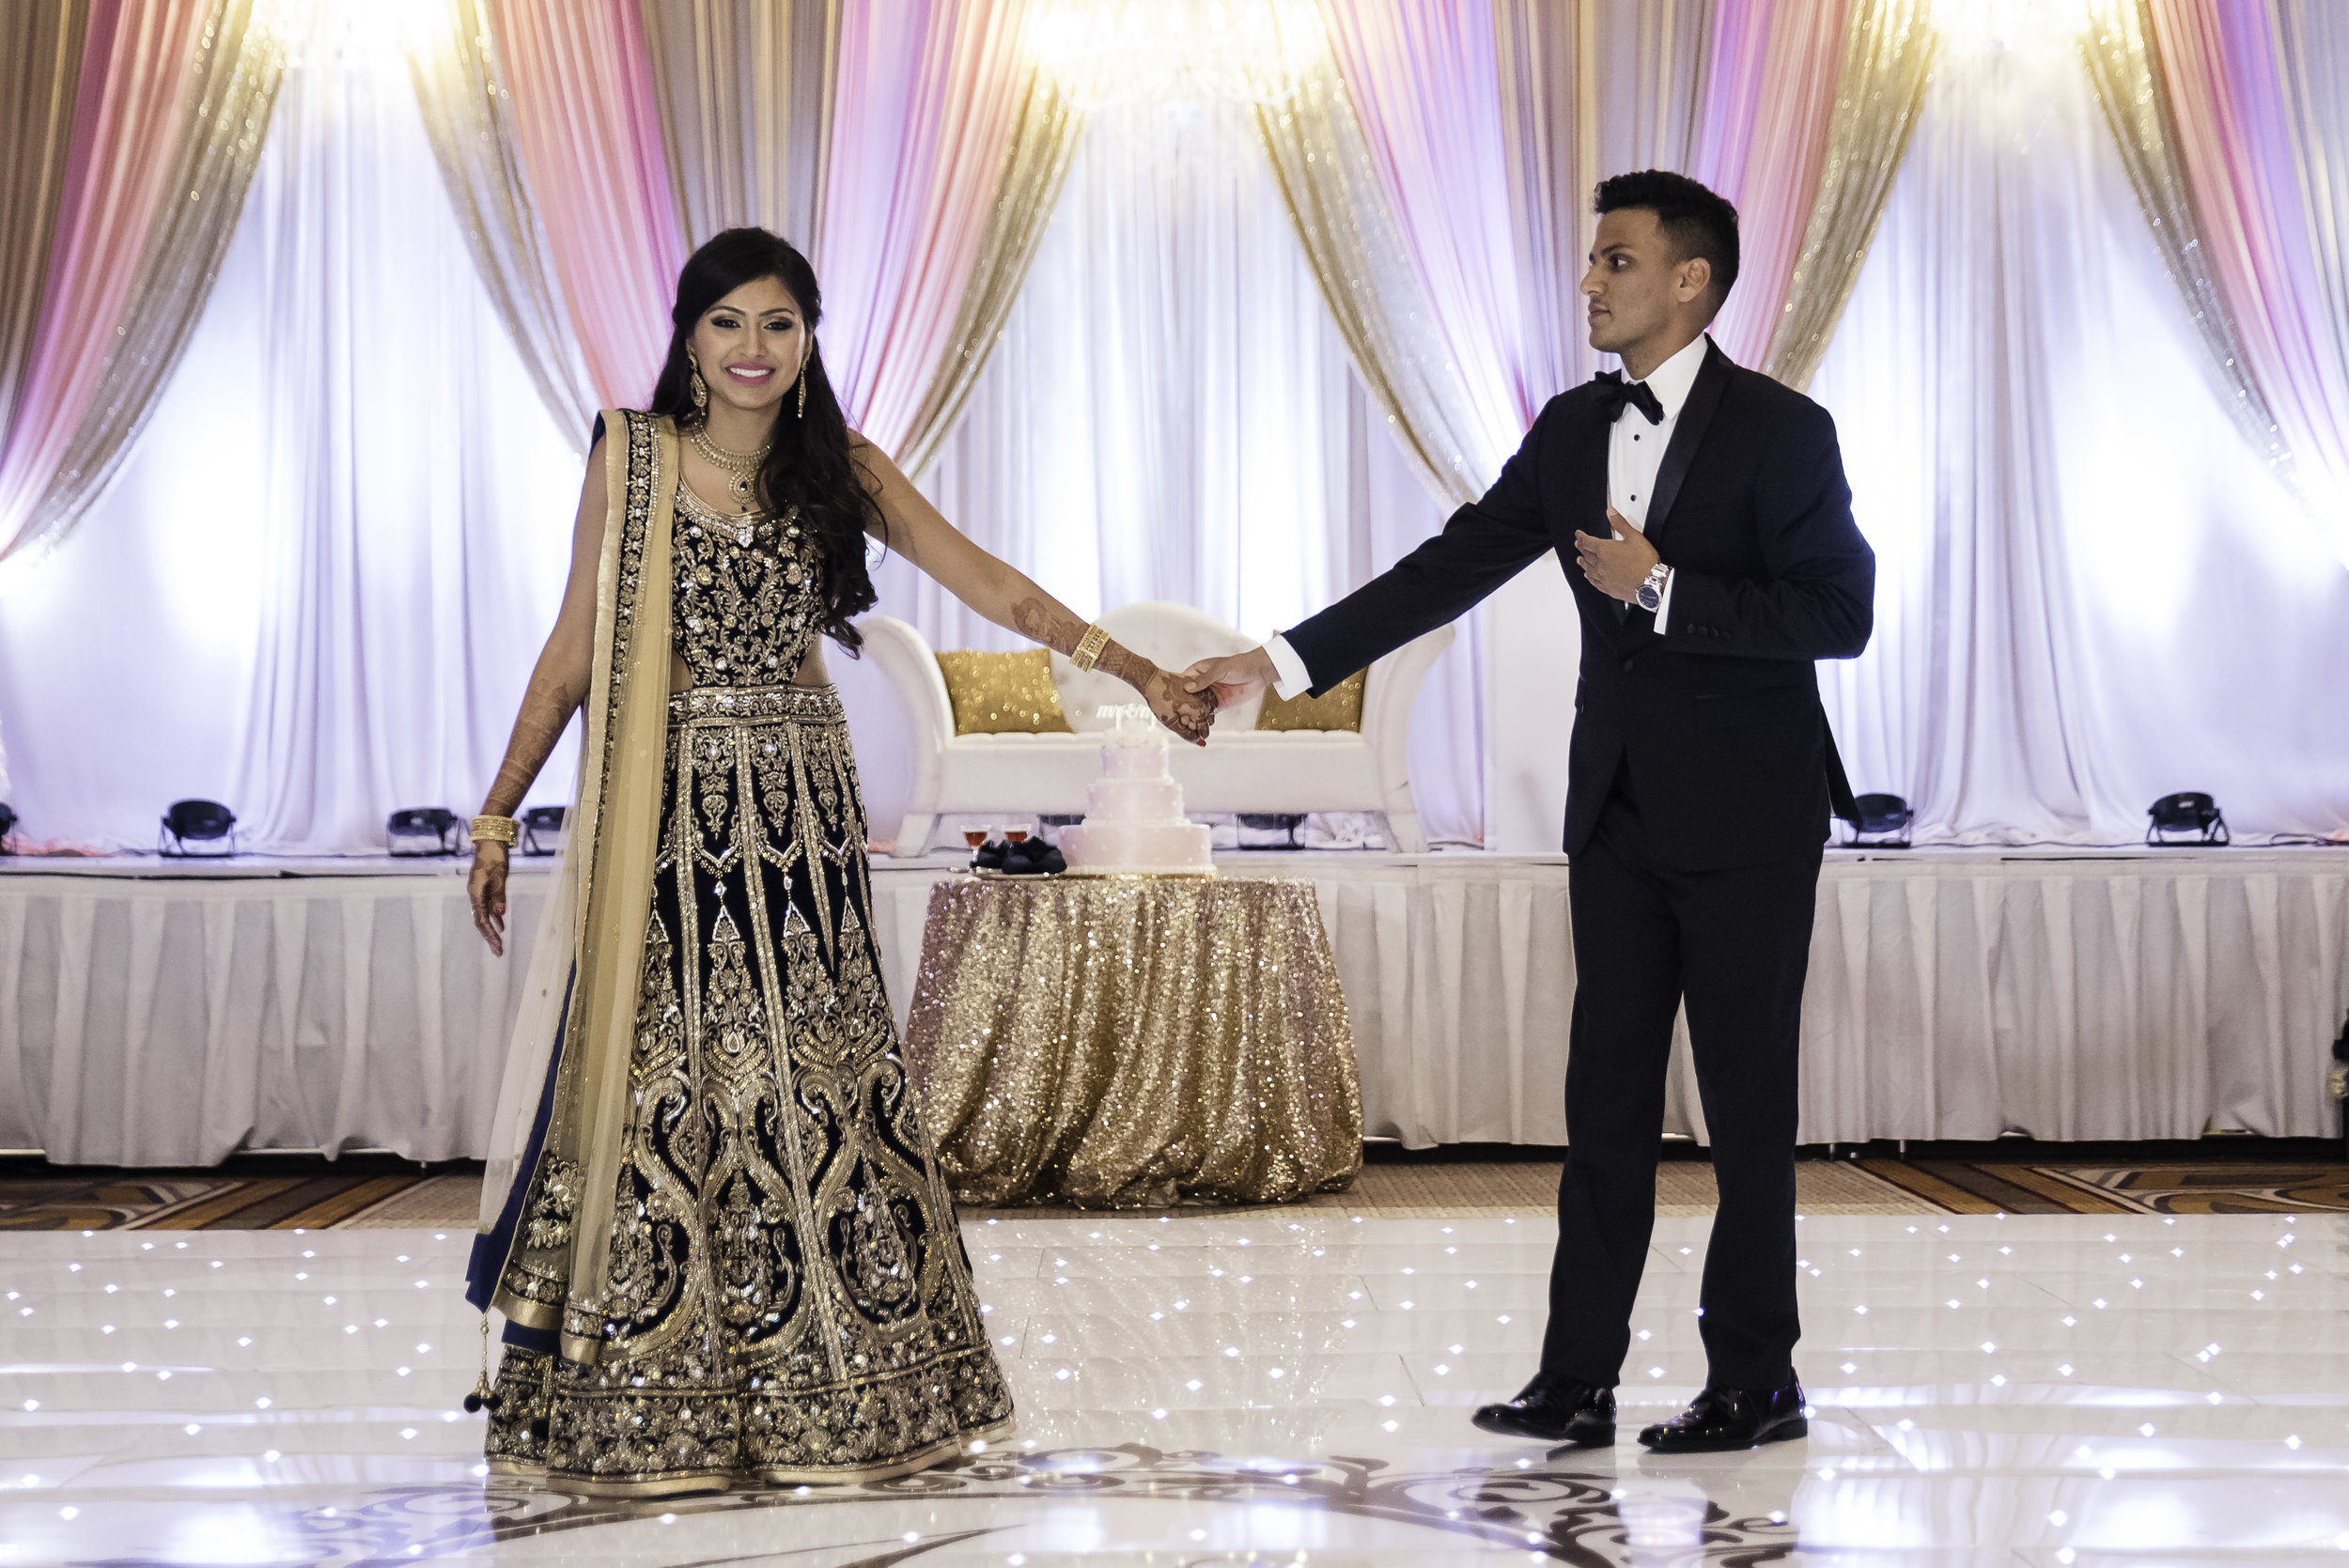 0823-JS-Sheraton-Tysons-Hotel-Wedding-Tysons-VA.jpg